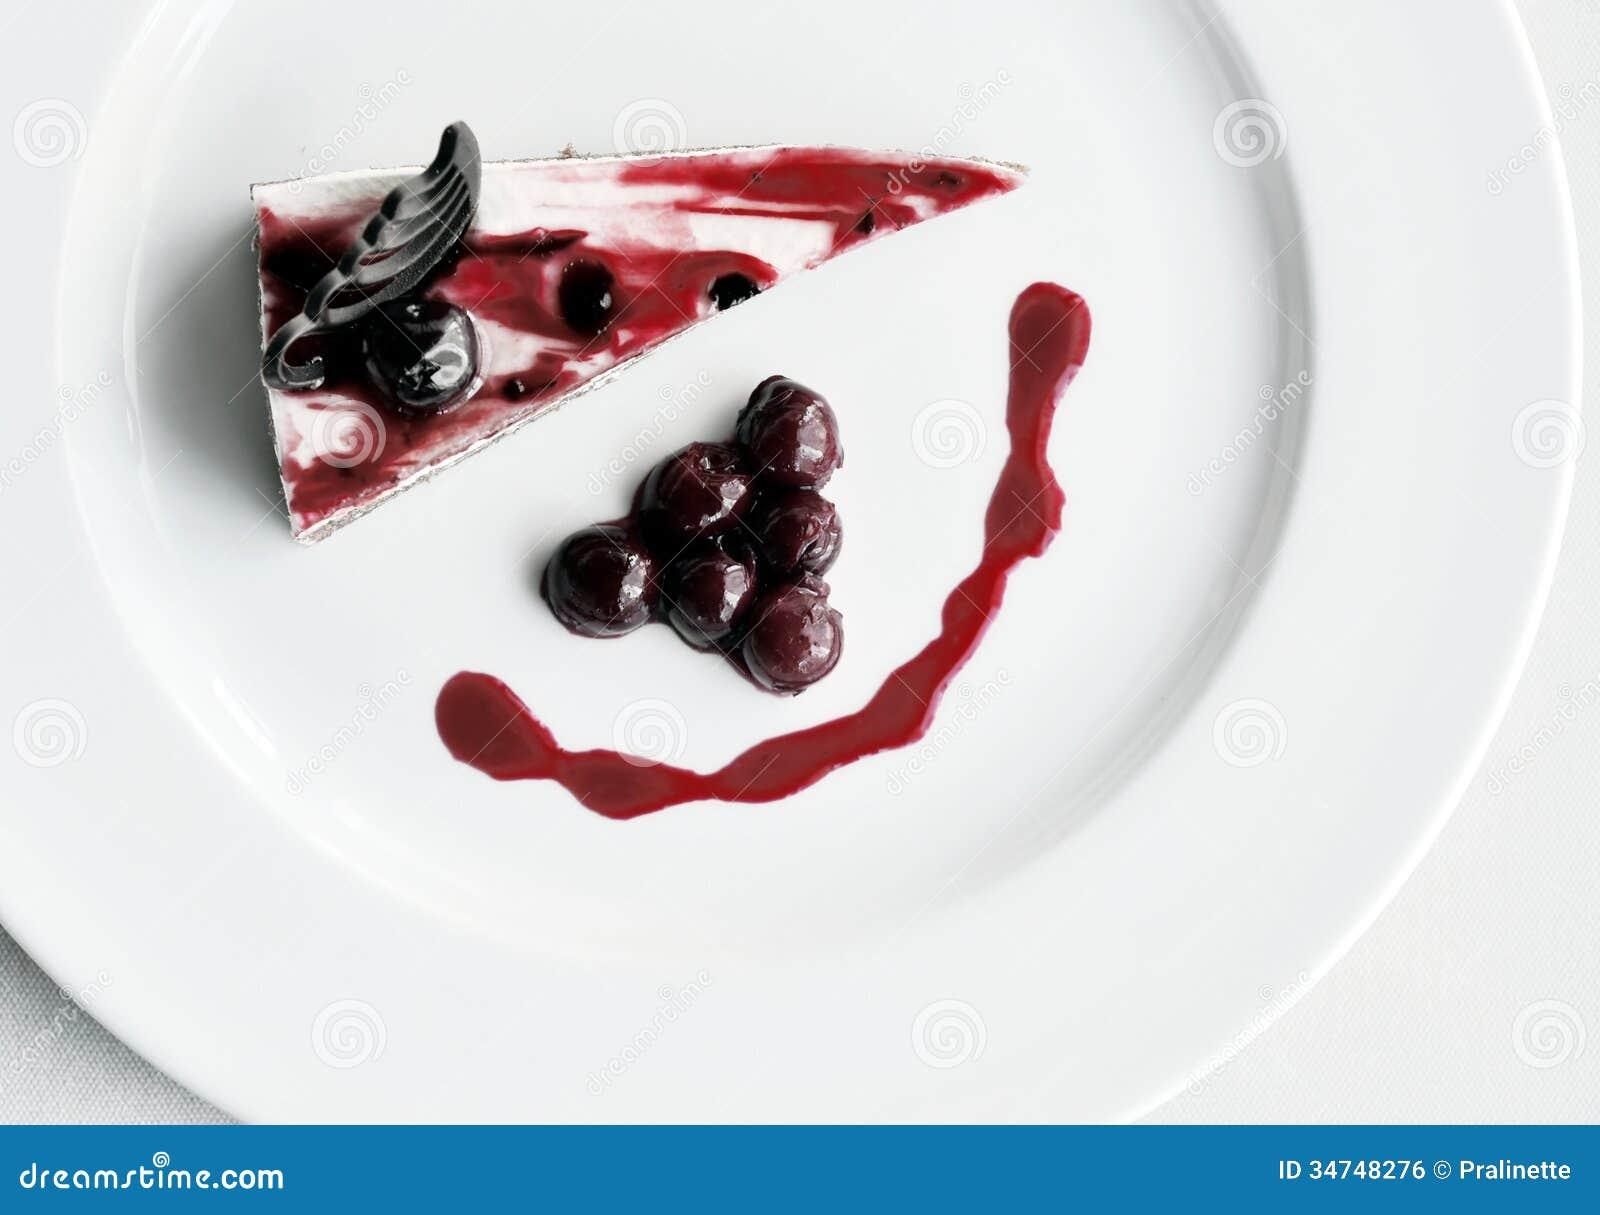 Cherry Sauce For Chocolate Cake